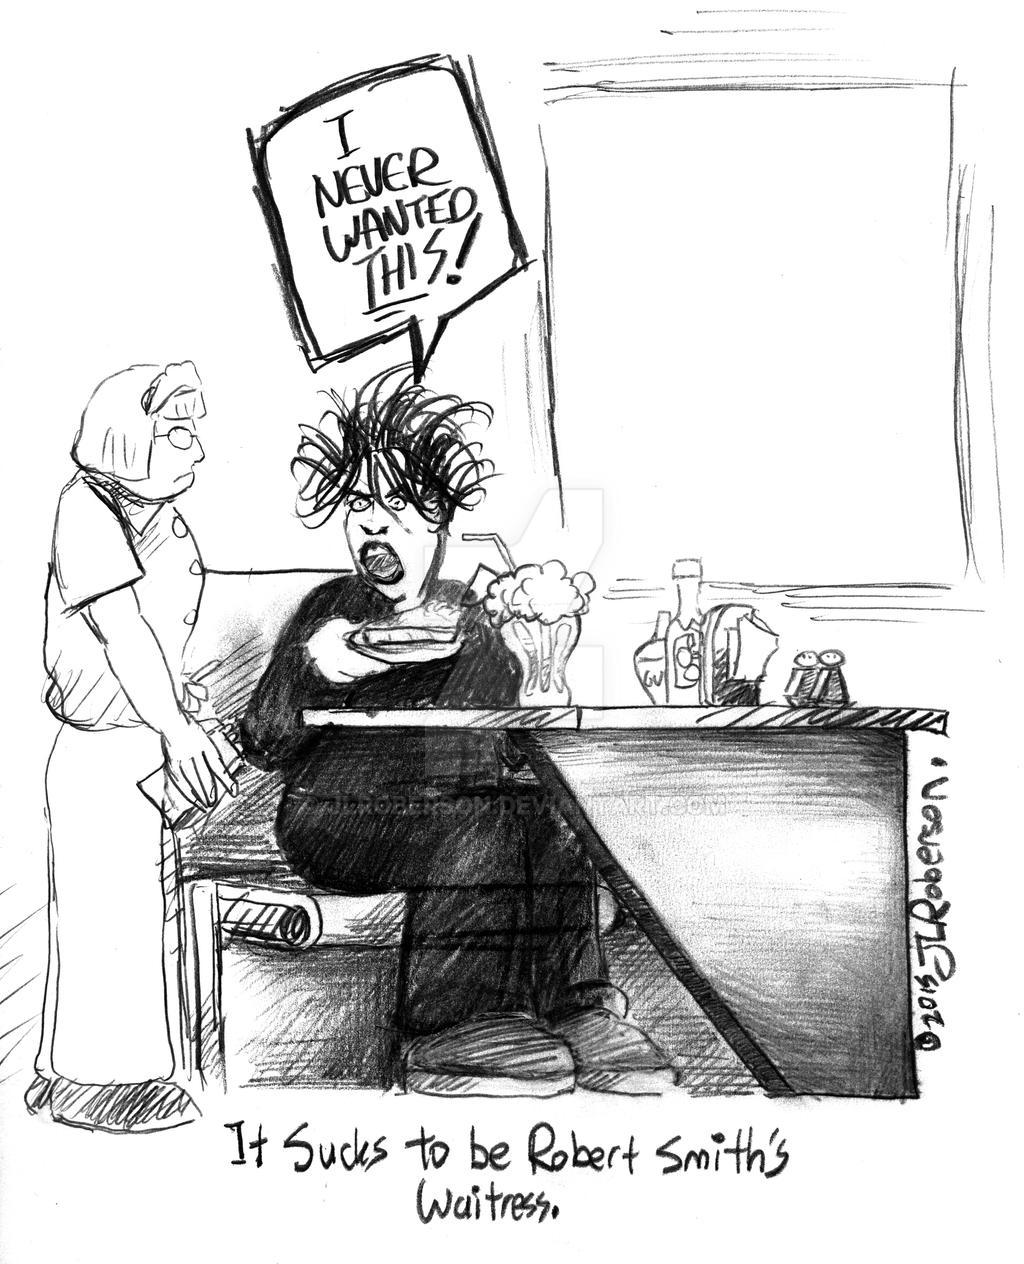 Robert Smith's Waitress (pencil)